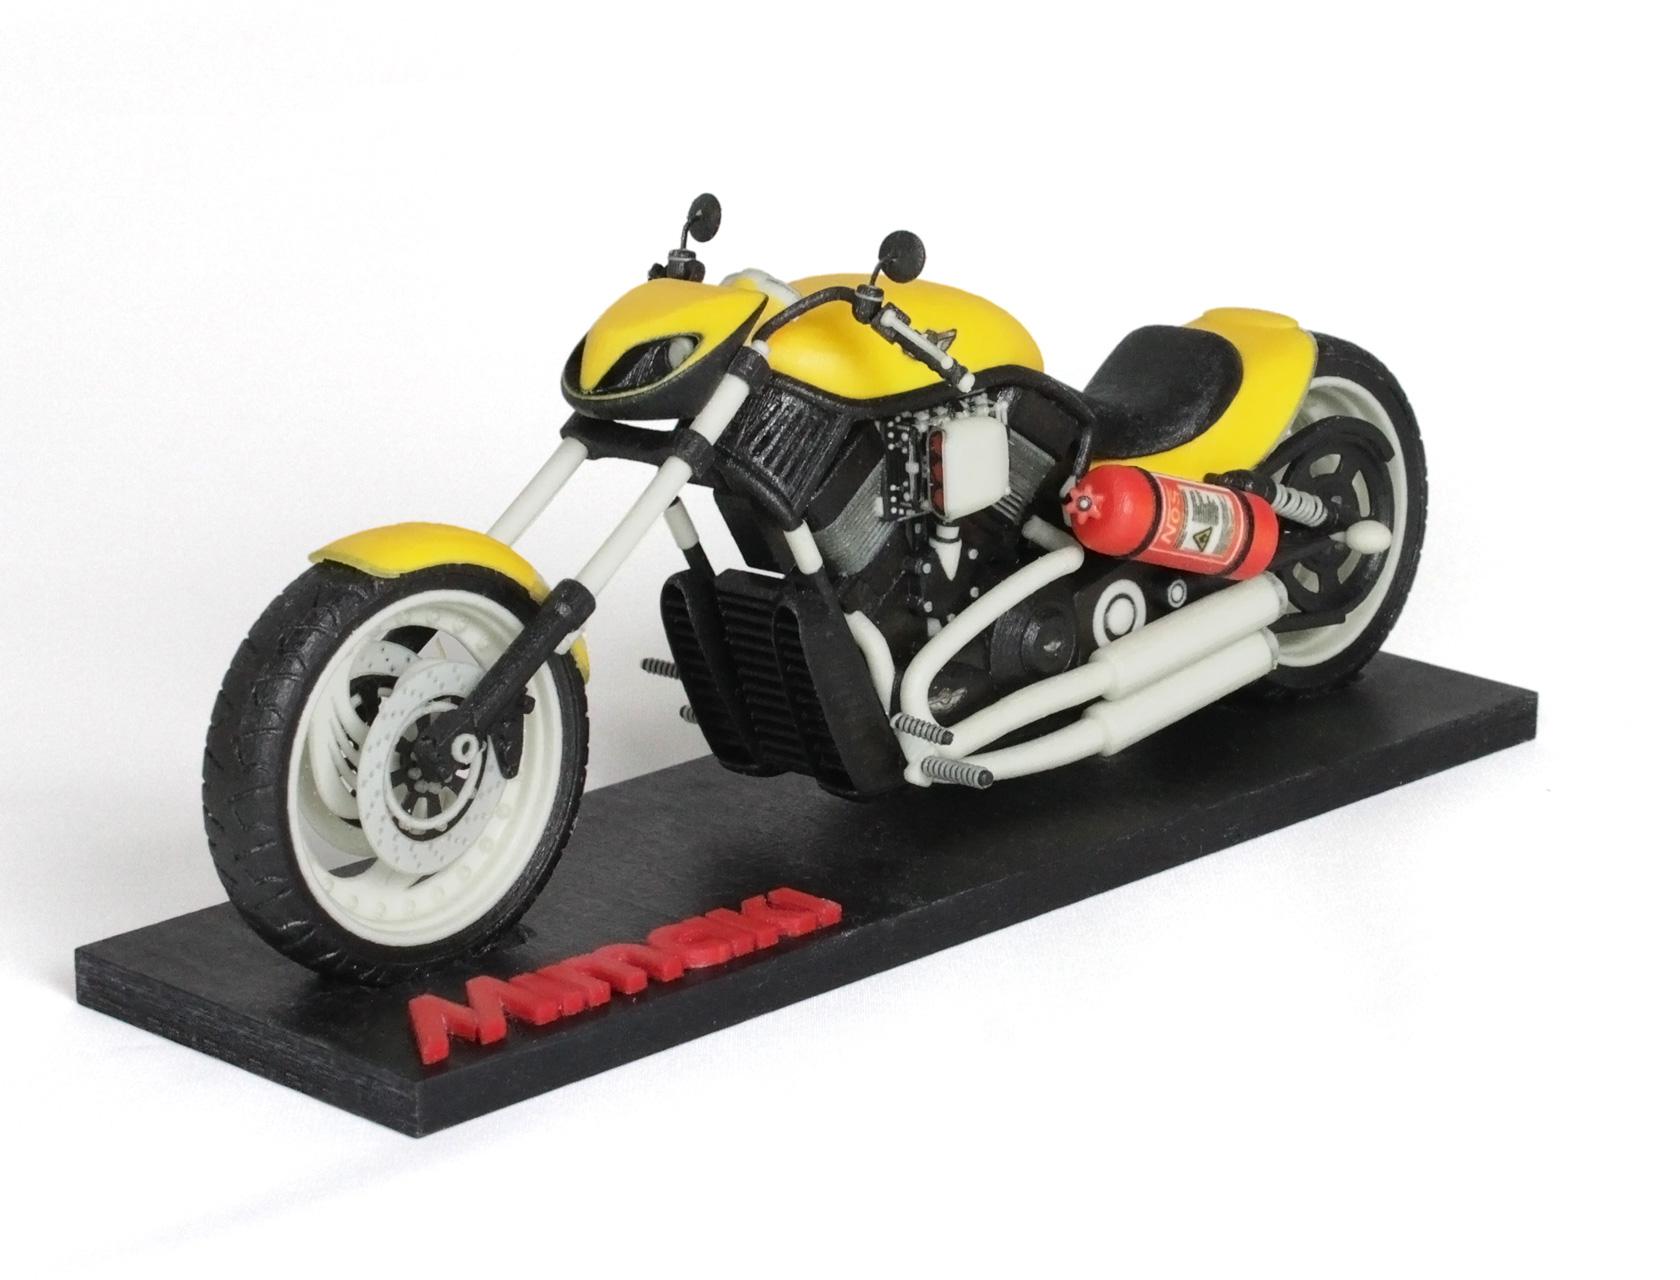 Mimaki 3duj-553 Motorcycle